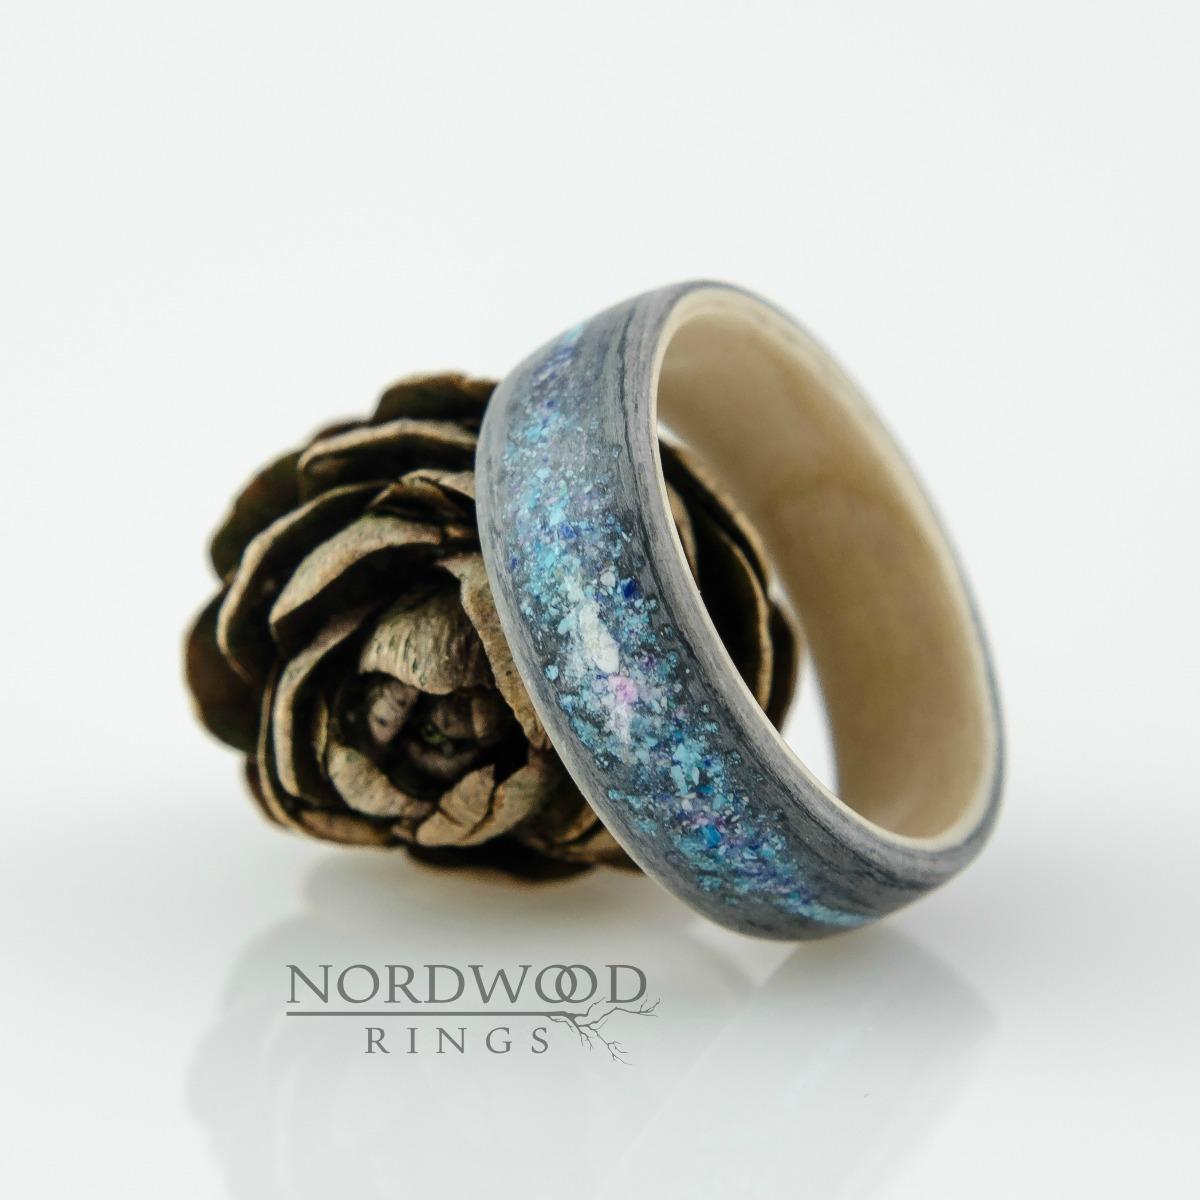 Nordwood Rings Dřevěný prstýnek GRAY OAK GALAXY NWR900/NE2